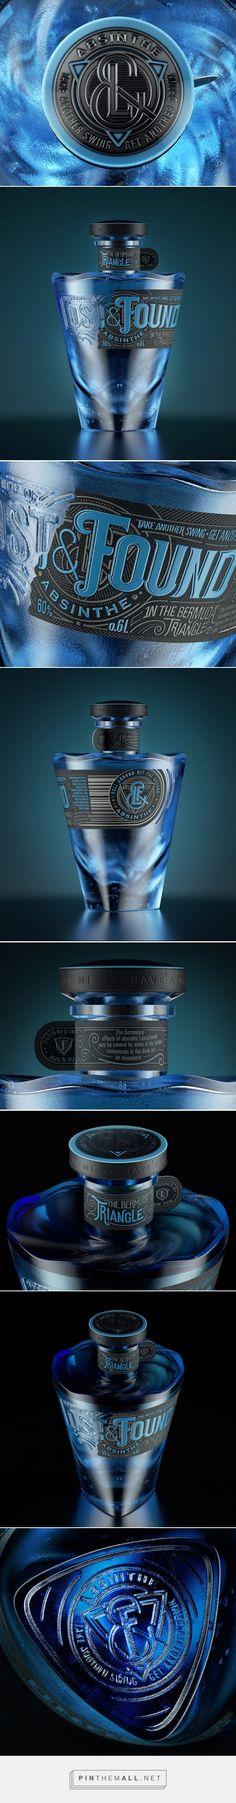 Lost&Found #Absinthe #concept #packaging designed by Galya Akhmetzyanova & Pavla Chuykina - http://www.packagingoftheworld.com/2015/03/lost-concept.html